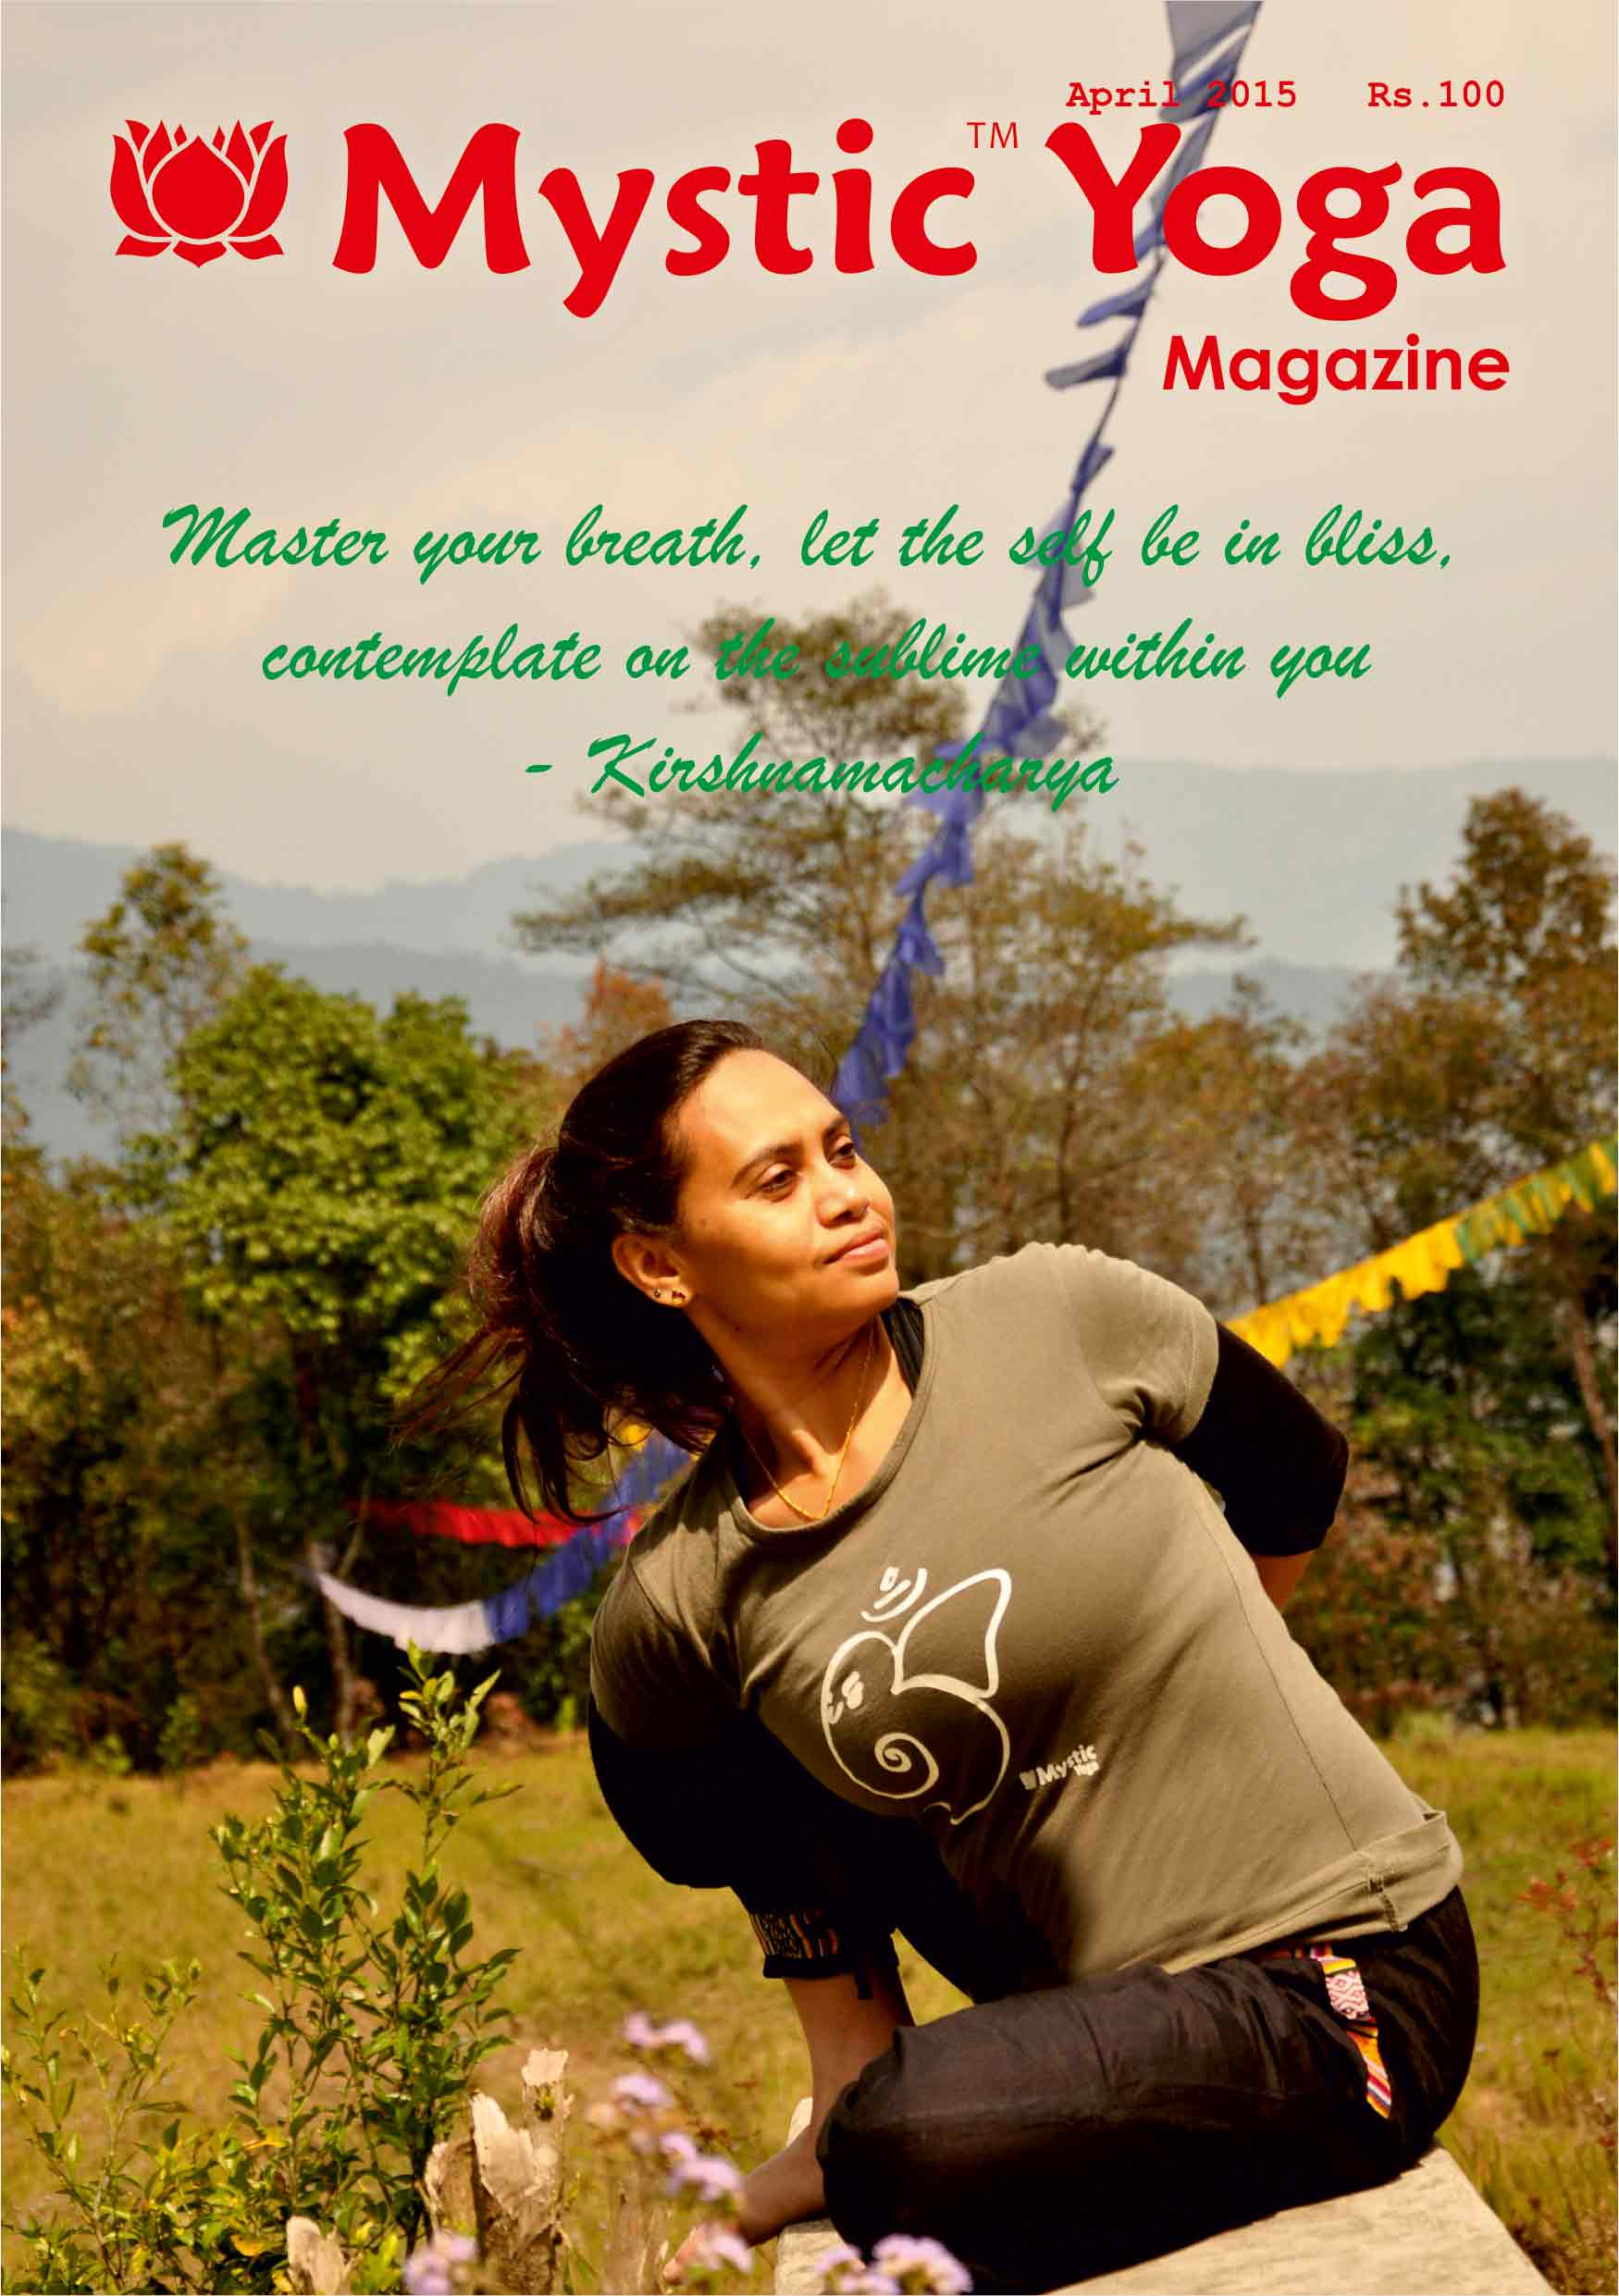 Mystic Yoga Magazine - April 2015